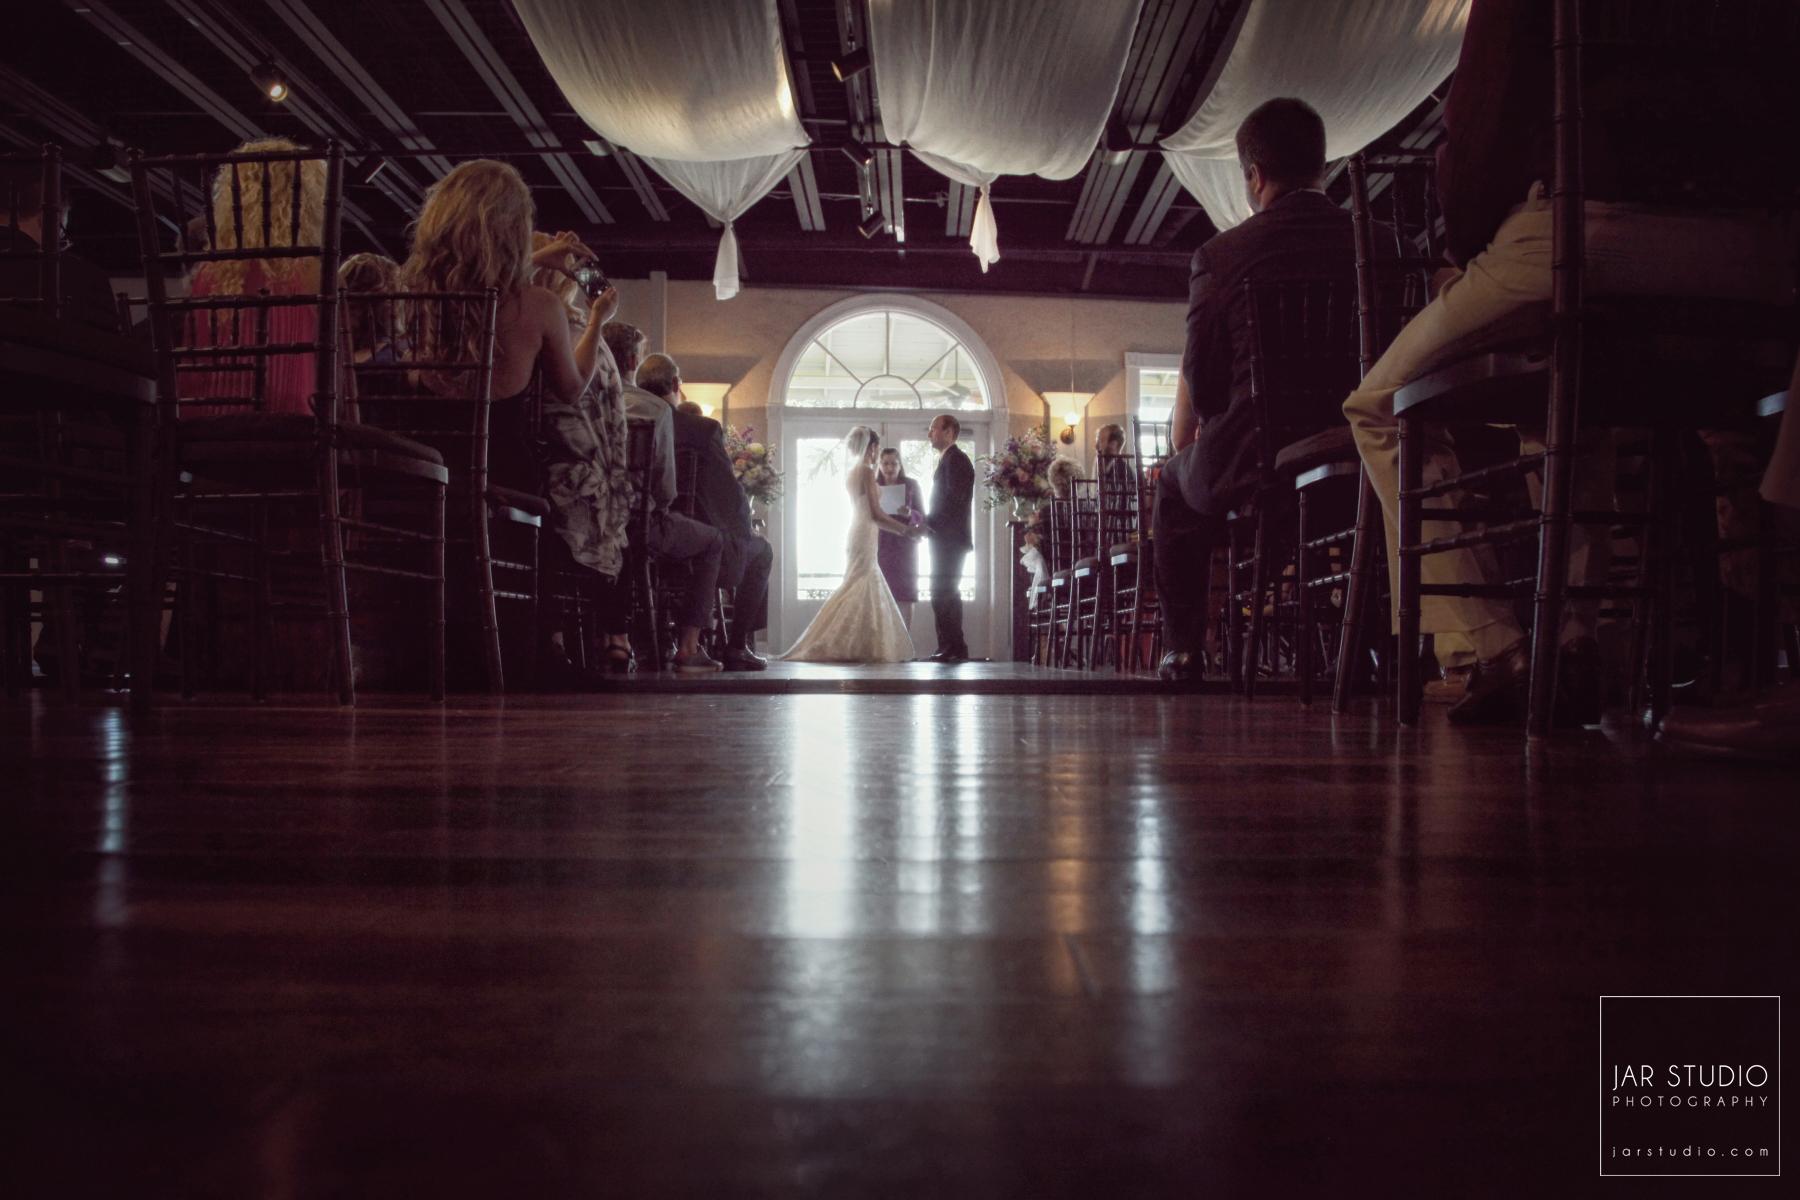 13-stylish-wedding-ceremony-the-grand-ball-room-jarstudio-photographer.JPG